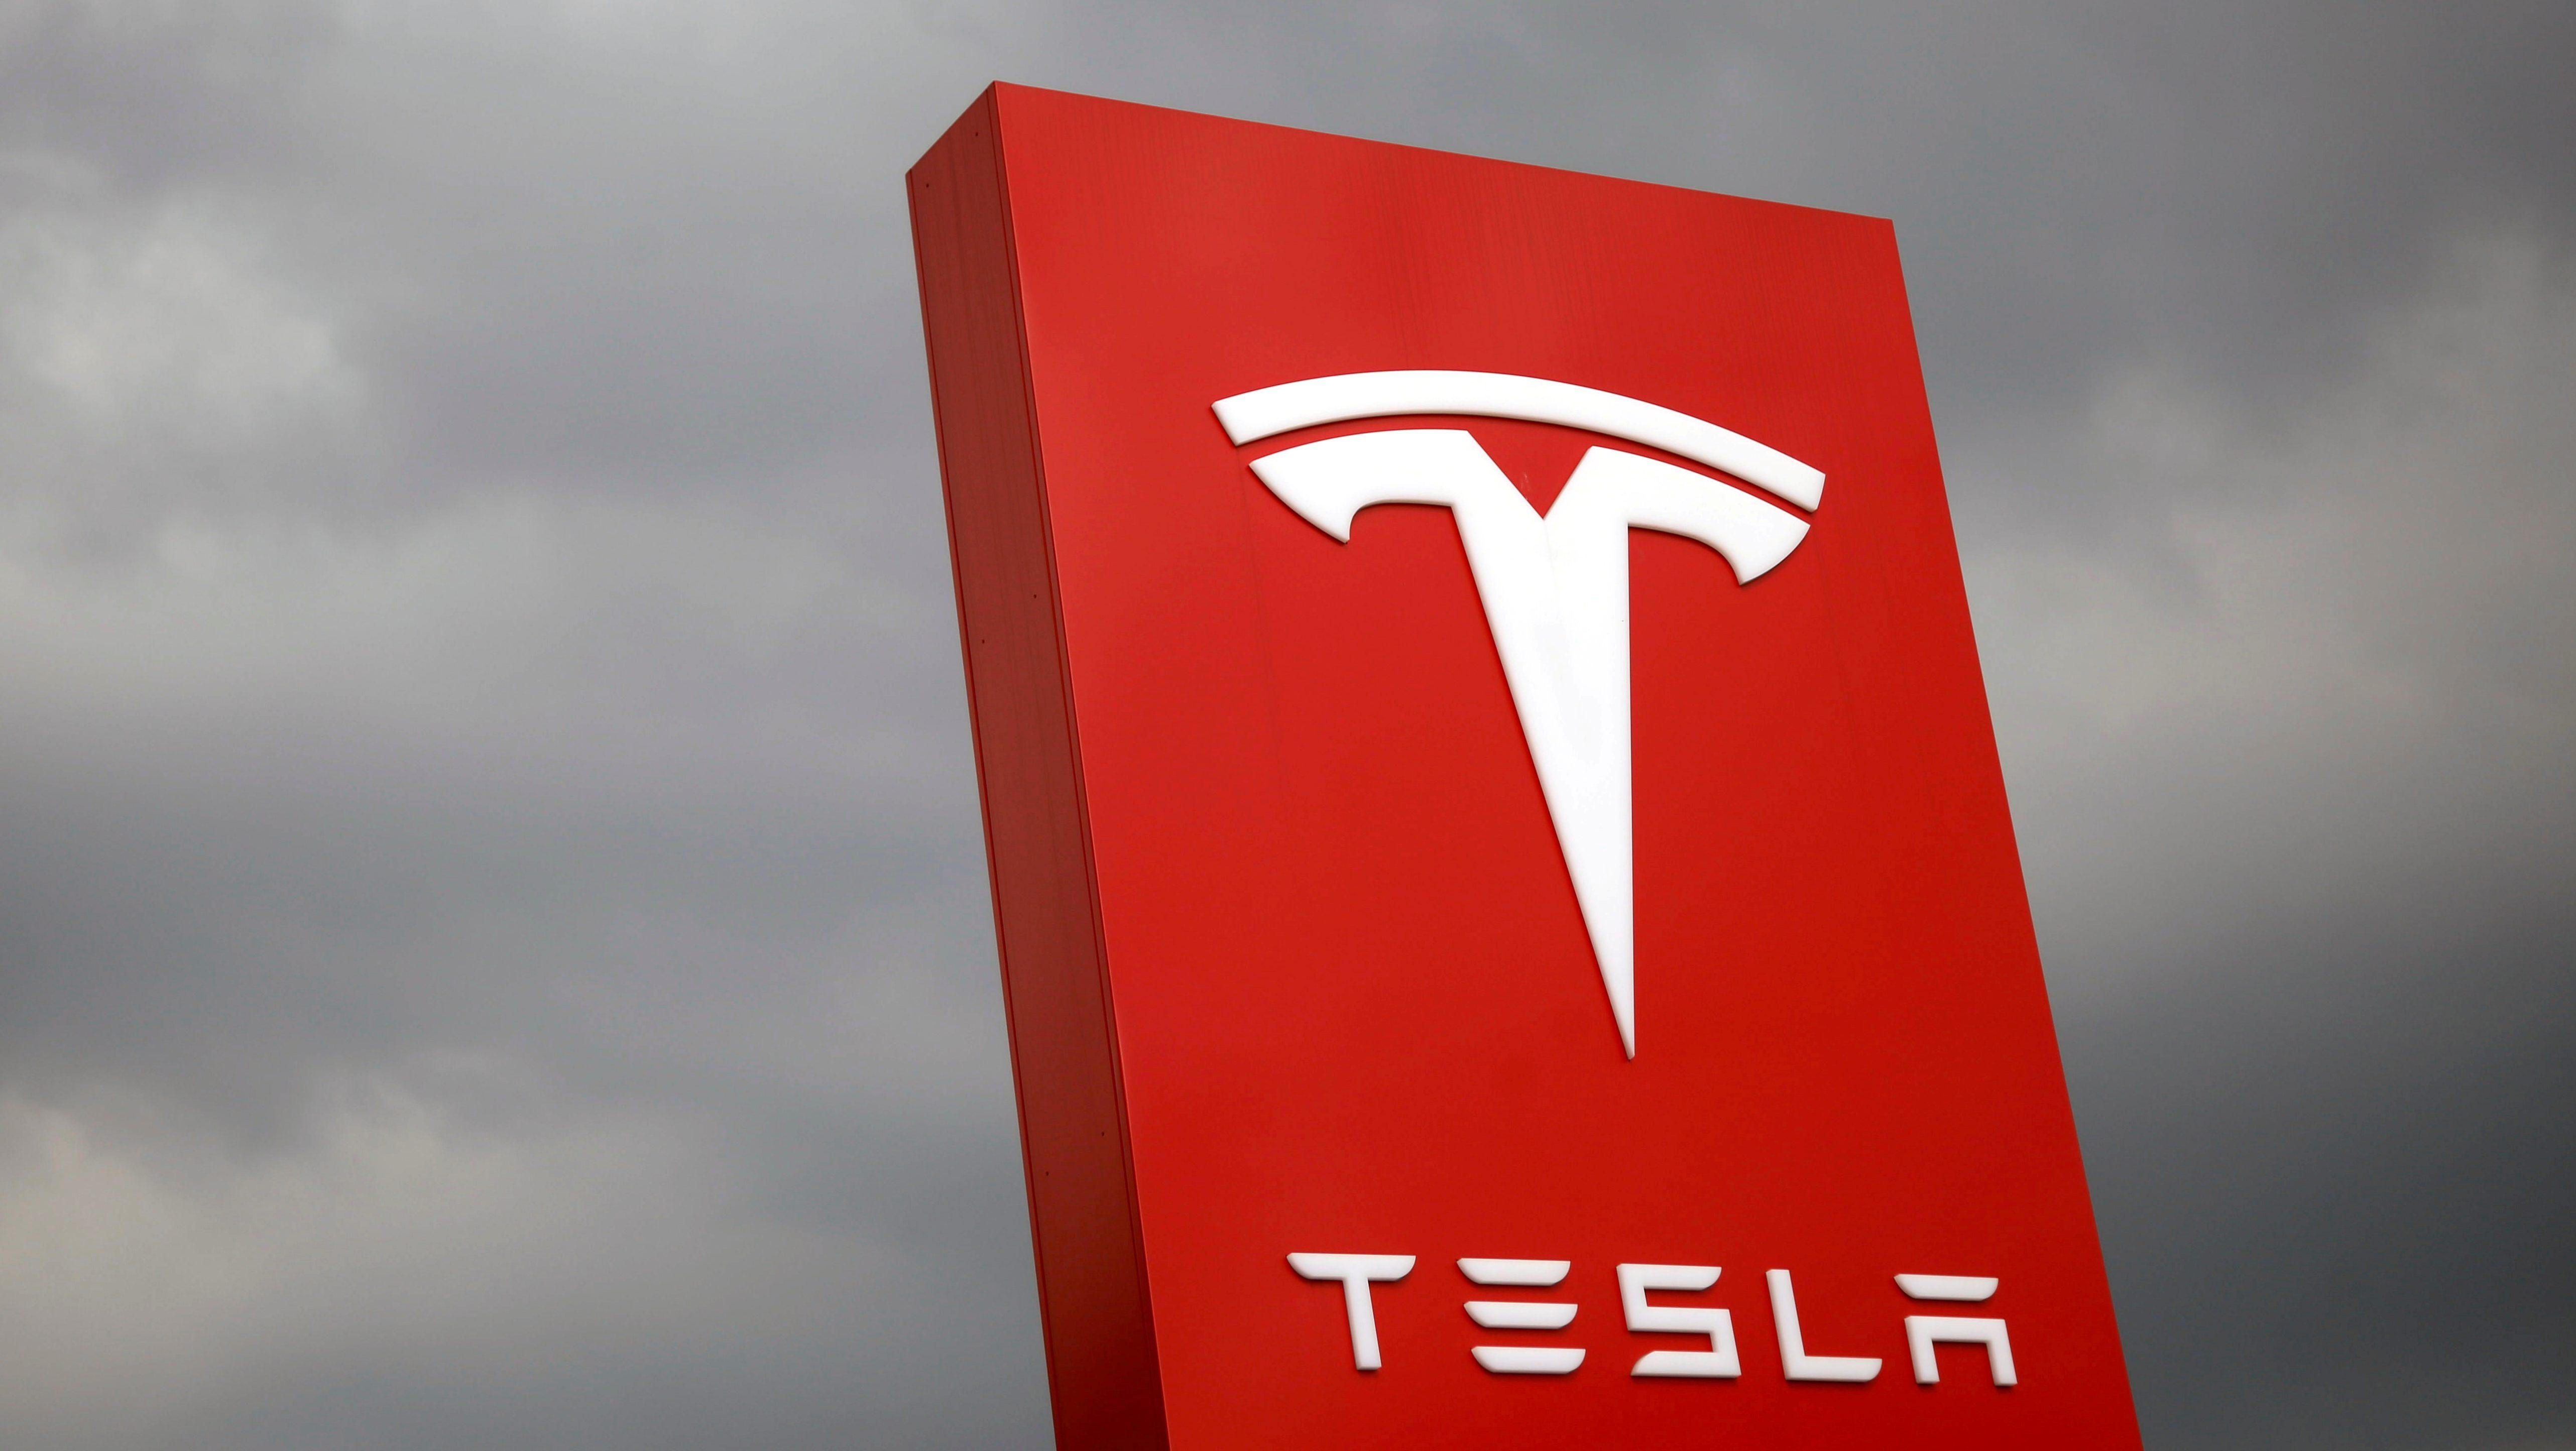 Tesla's Competitors Close In, Elon Musk Remains Optimistic